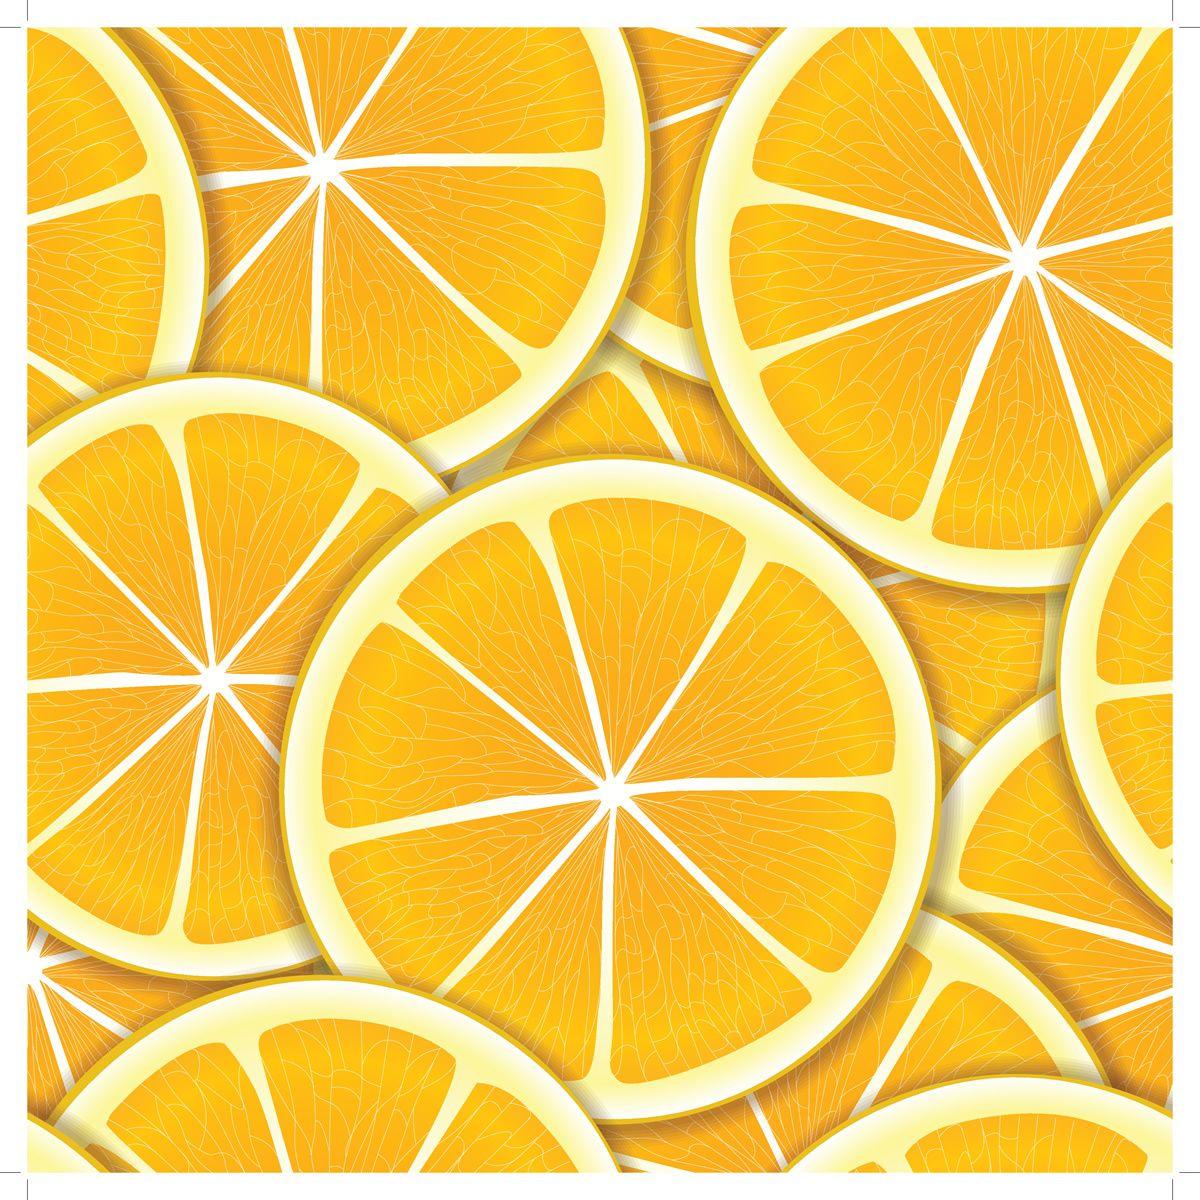 Lemon, Orange Y Fruit